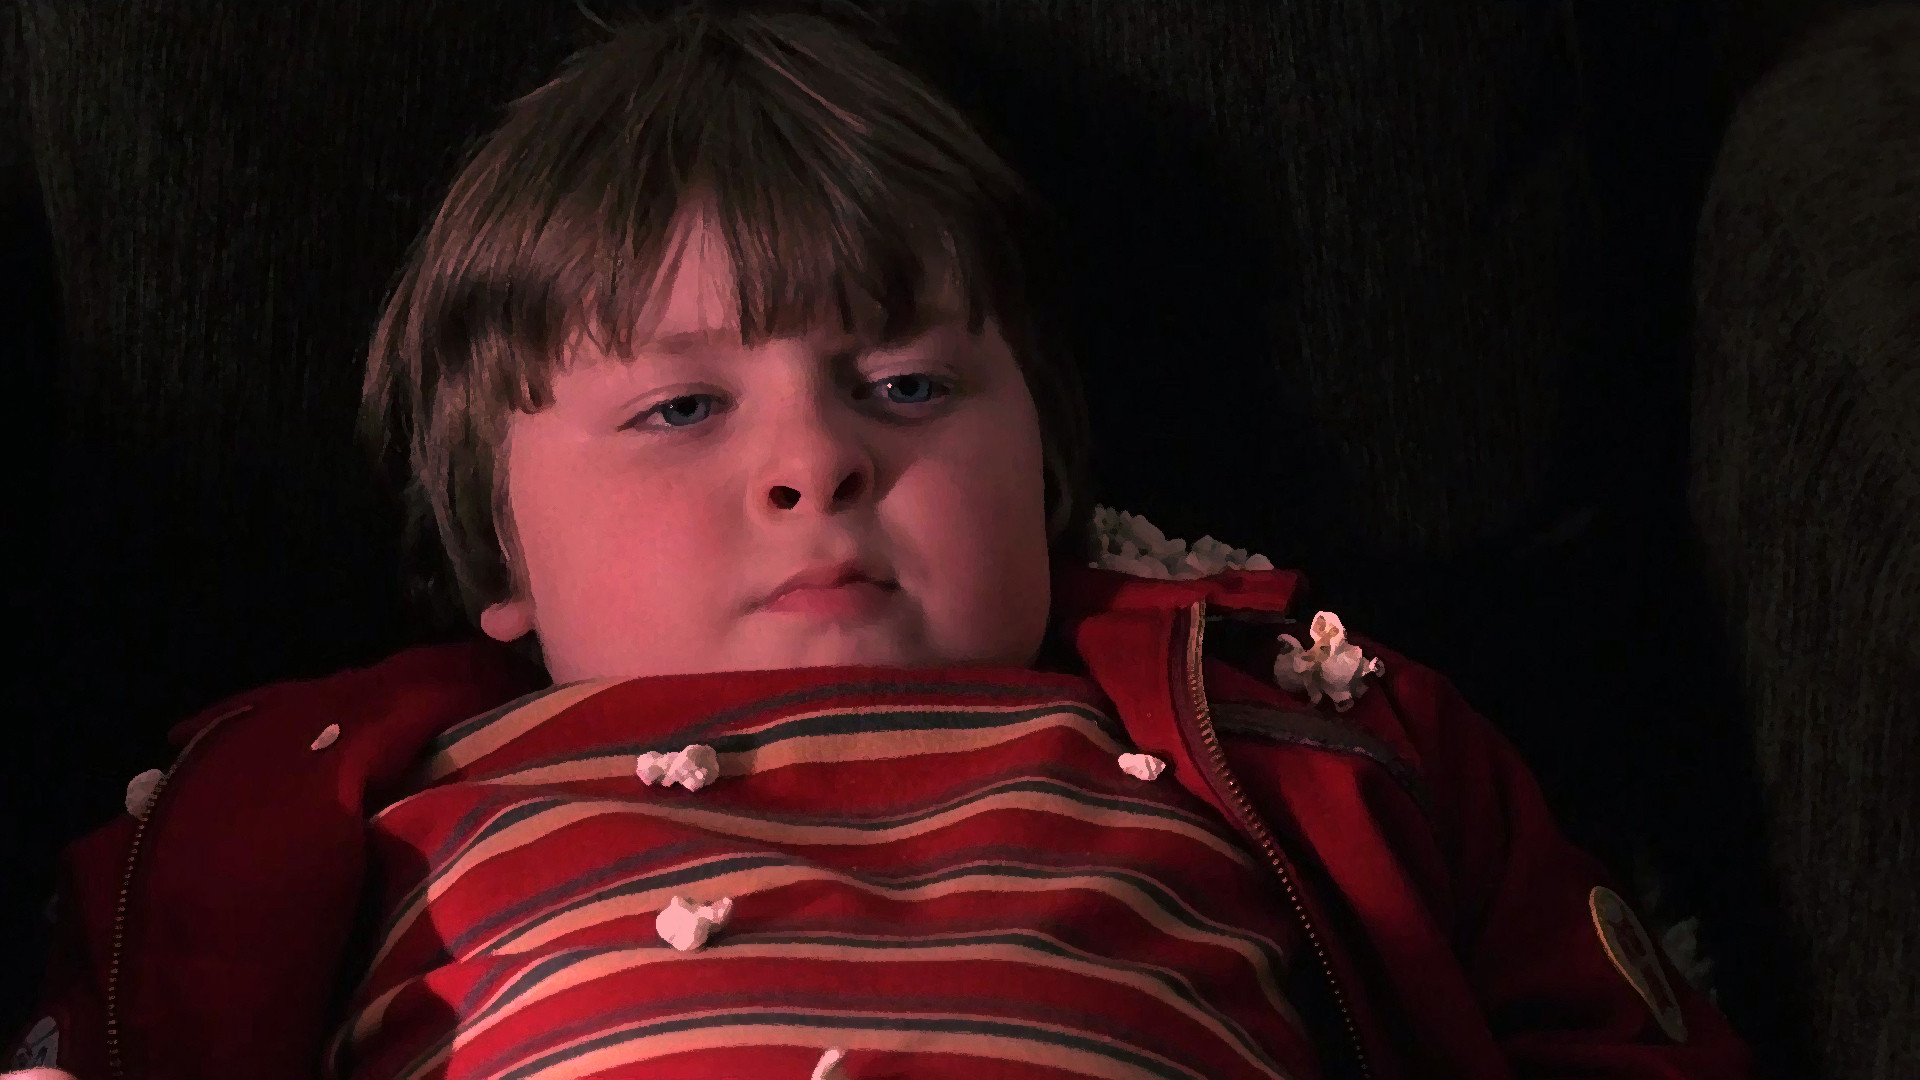 Ver The kid (2000) Online Latino HD - Pelisplus